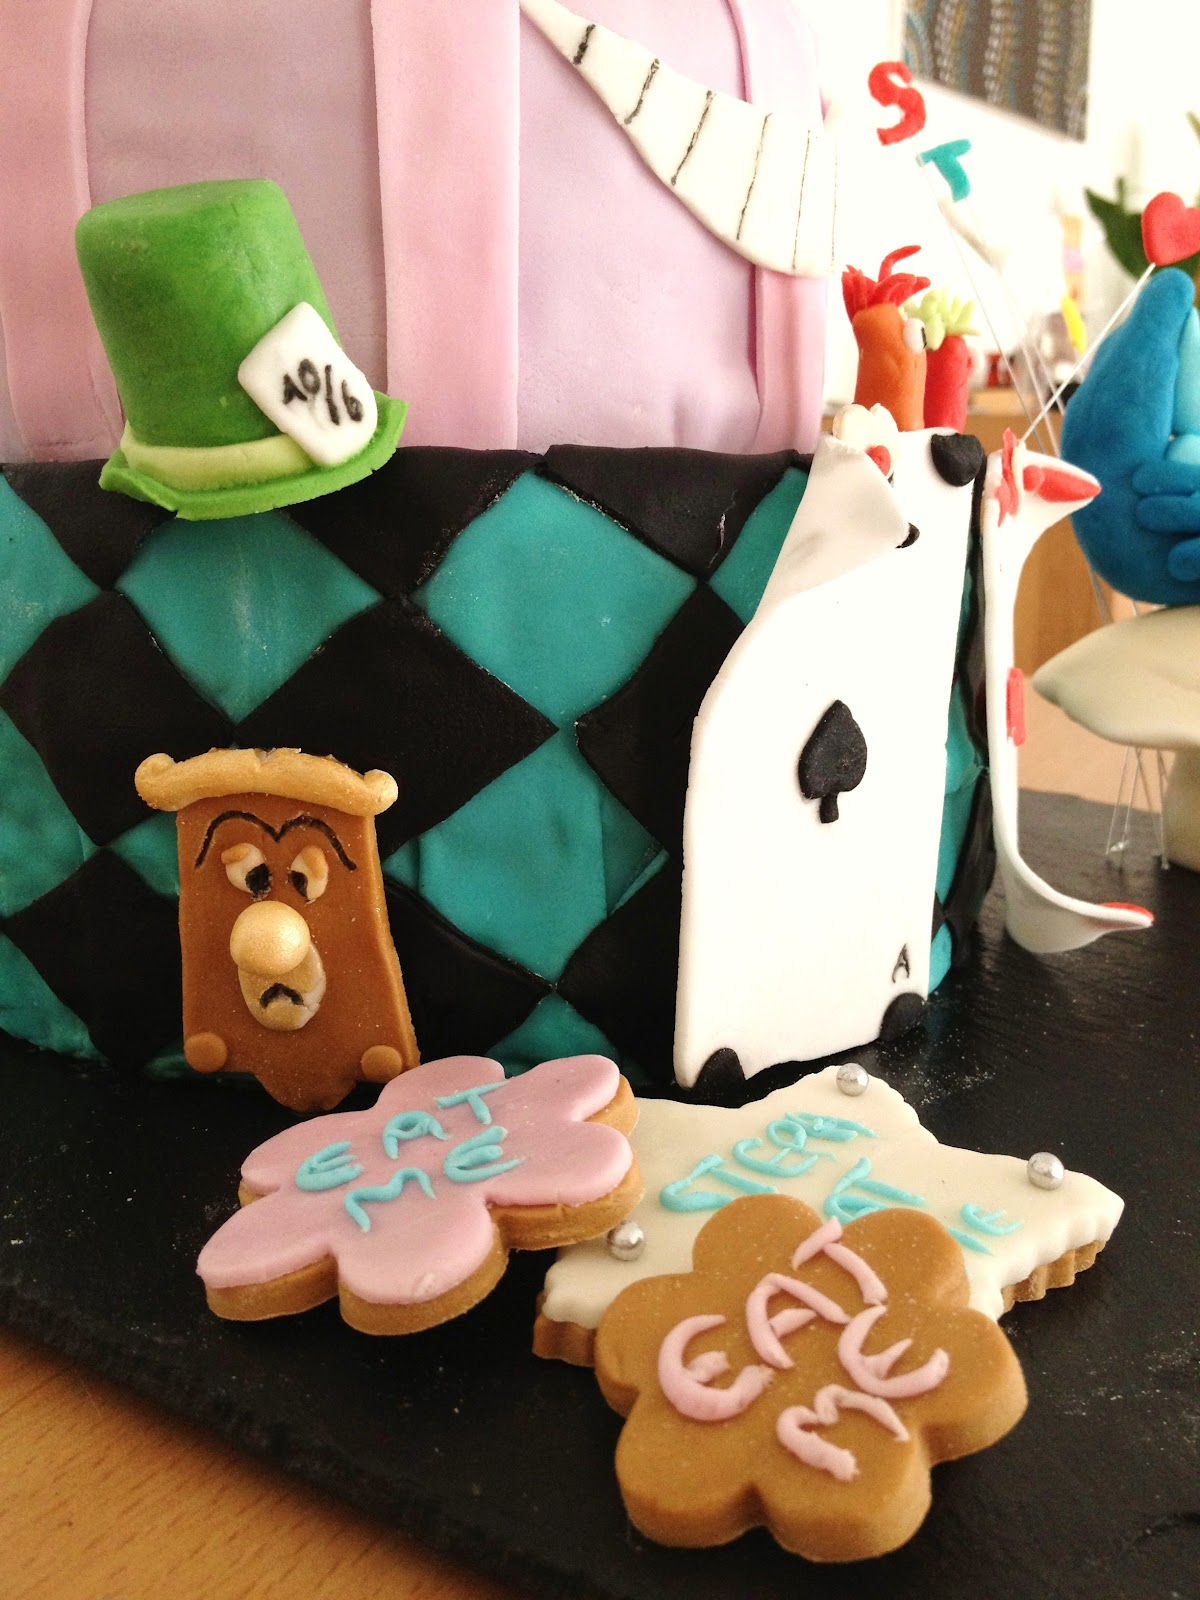 fabtastic cakes g teau alice au pays des merveilles. Black Bedroom Furniture Sets. Home Design Ideas